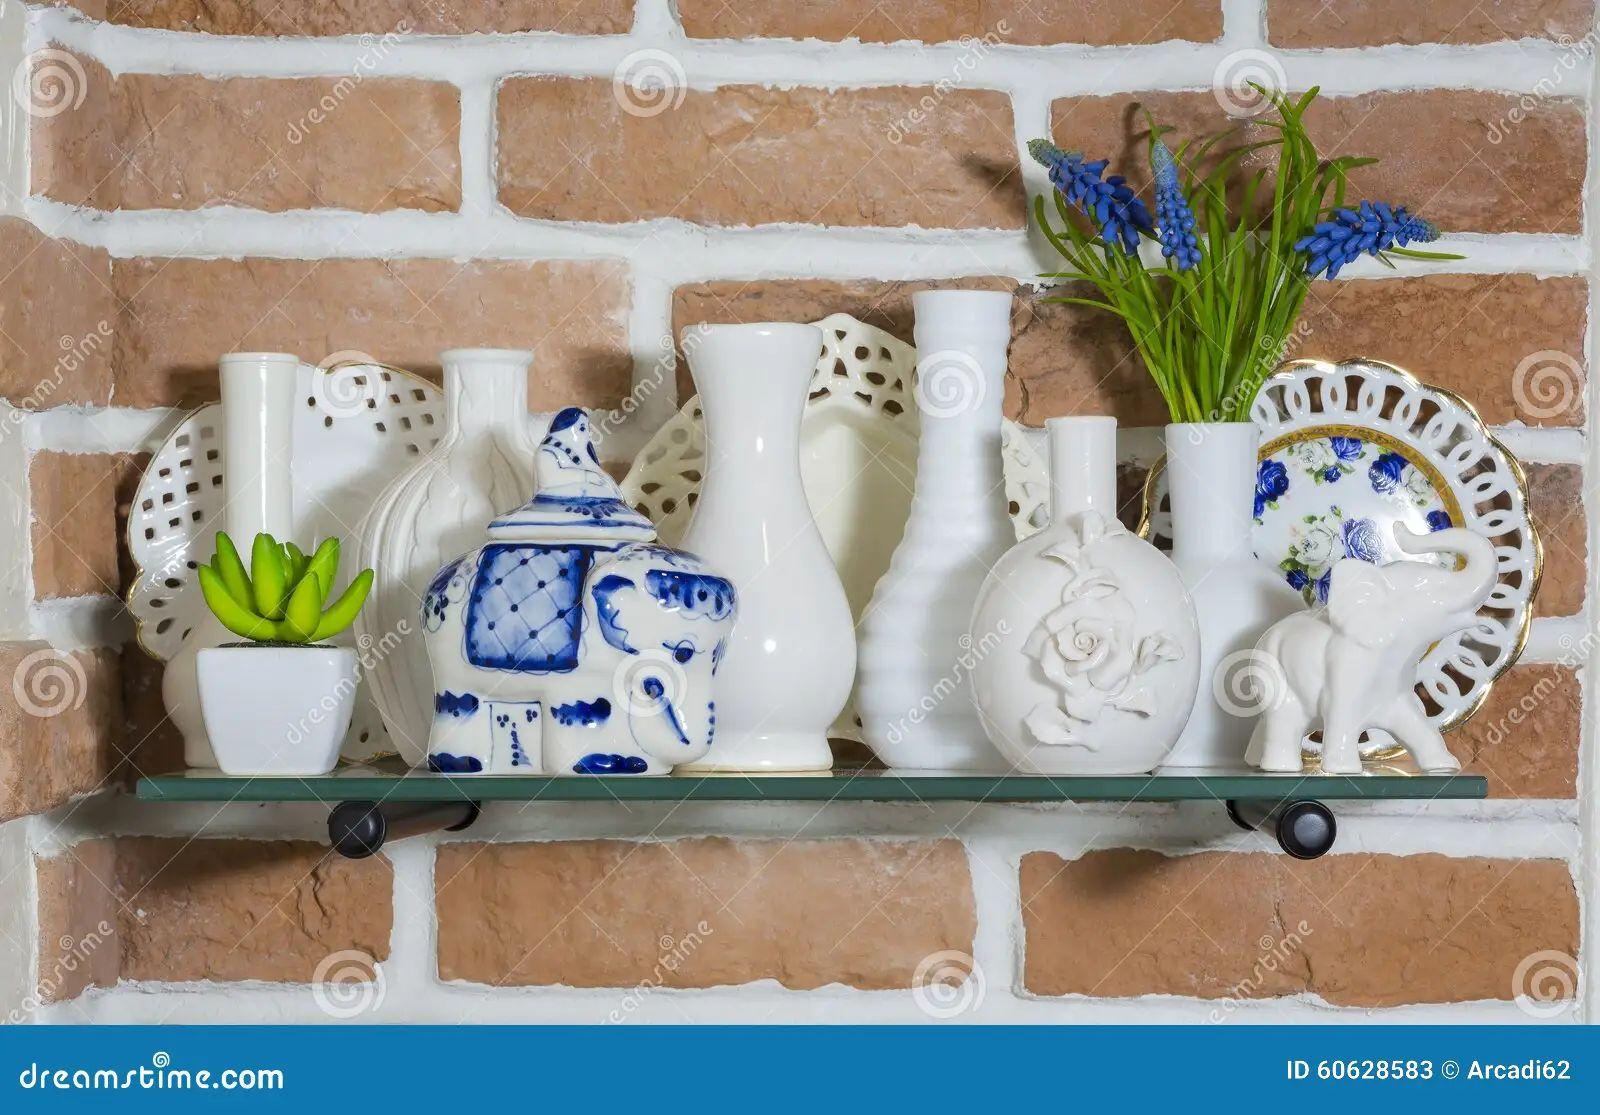 White ceramic plates for crafts - White Ceramic Plates For Crafts White Ceramic Plates For Crafts Utensils Plates Shelf Kitchen Download